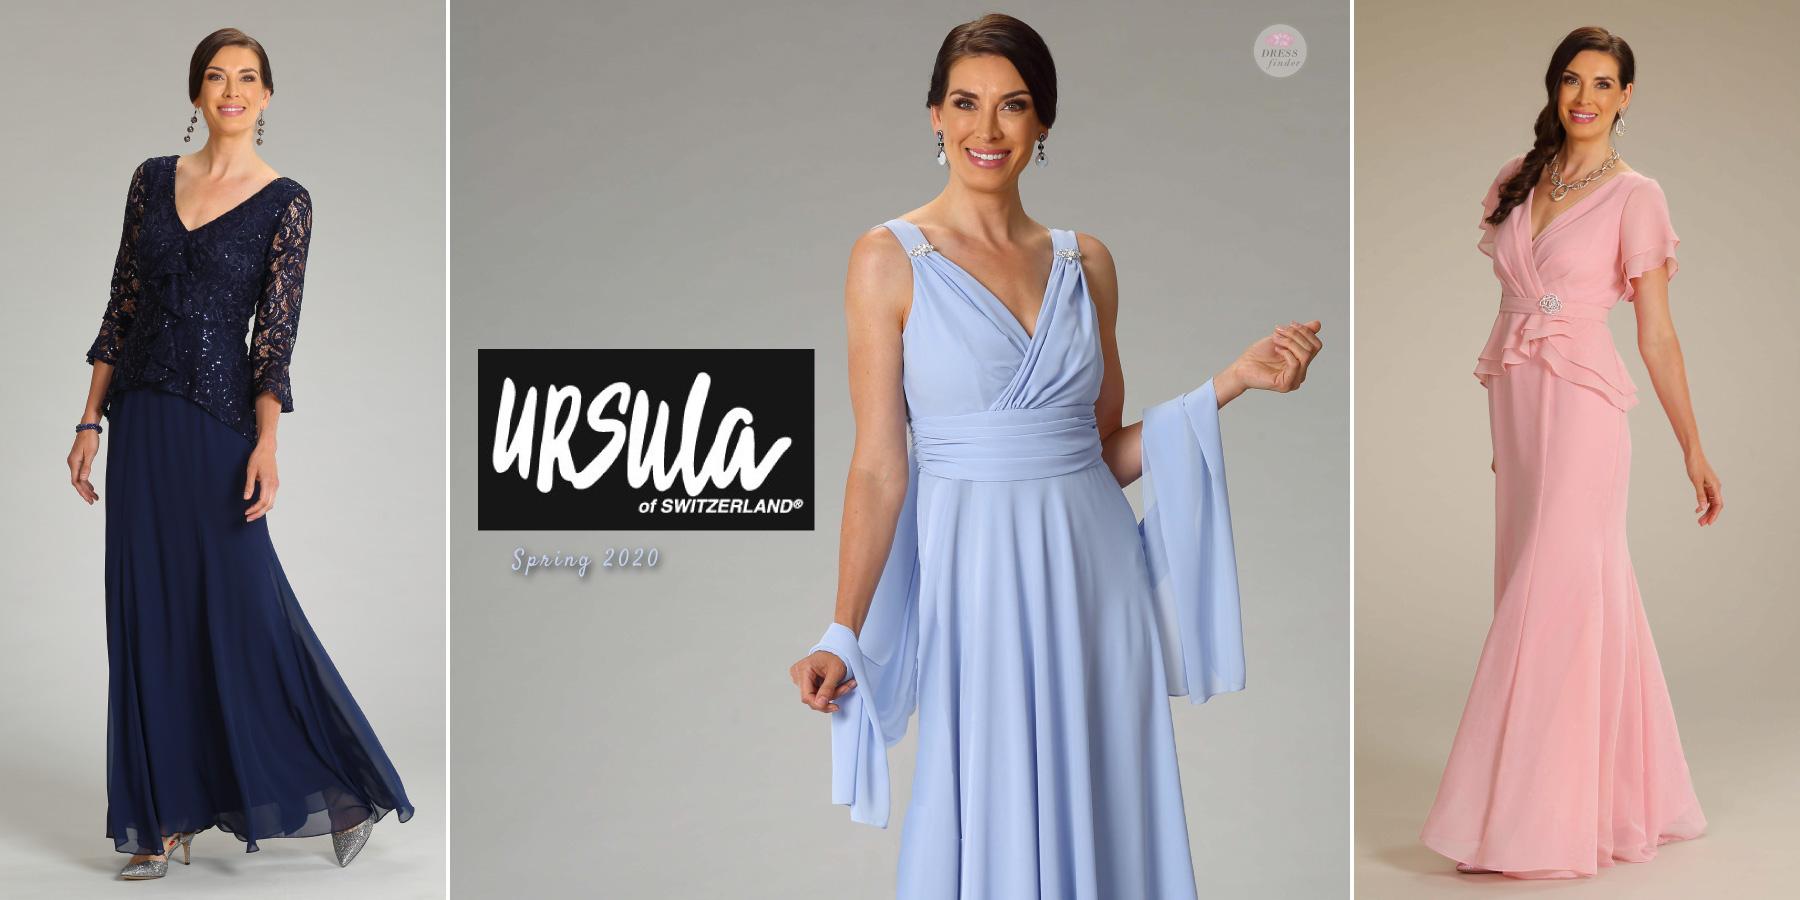 Ursula of Switzerland